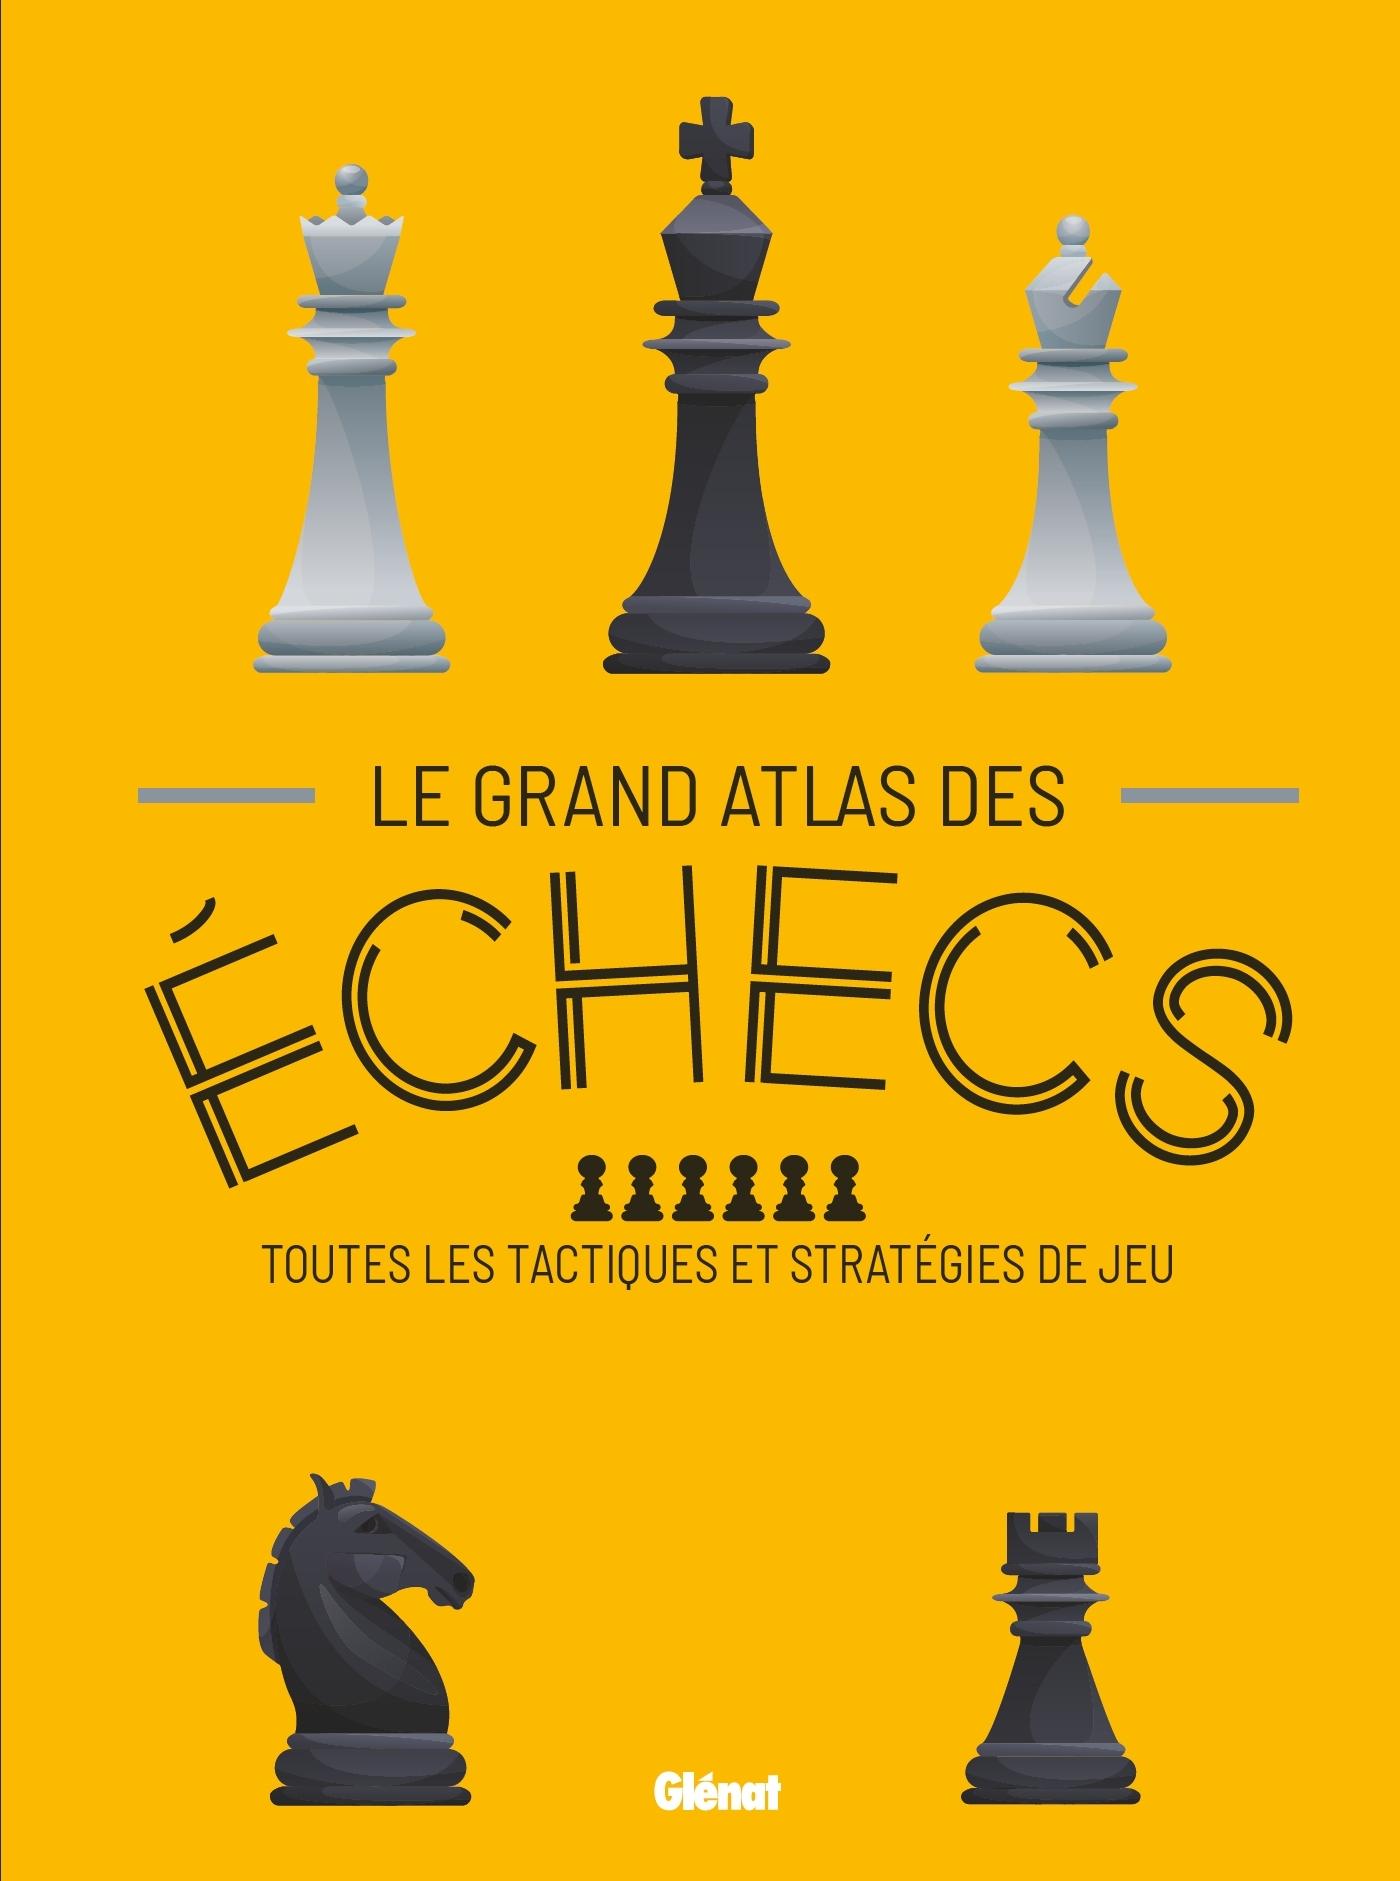 LE GRAND ATLAS DES ECHECS - TOUTES LES TACTIQUES ET STRATEGIES DE JEU